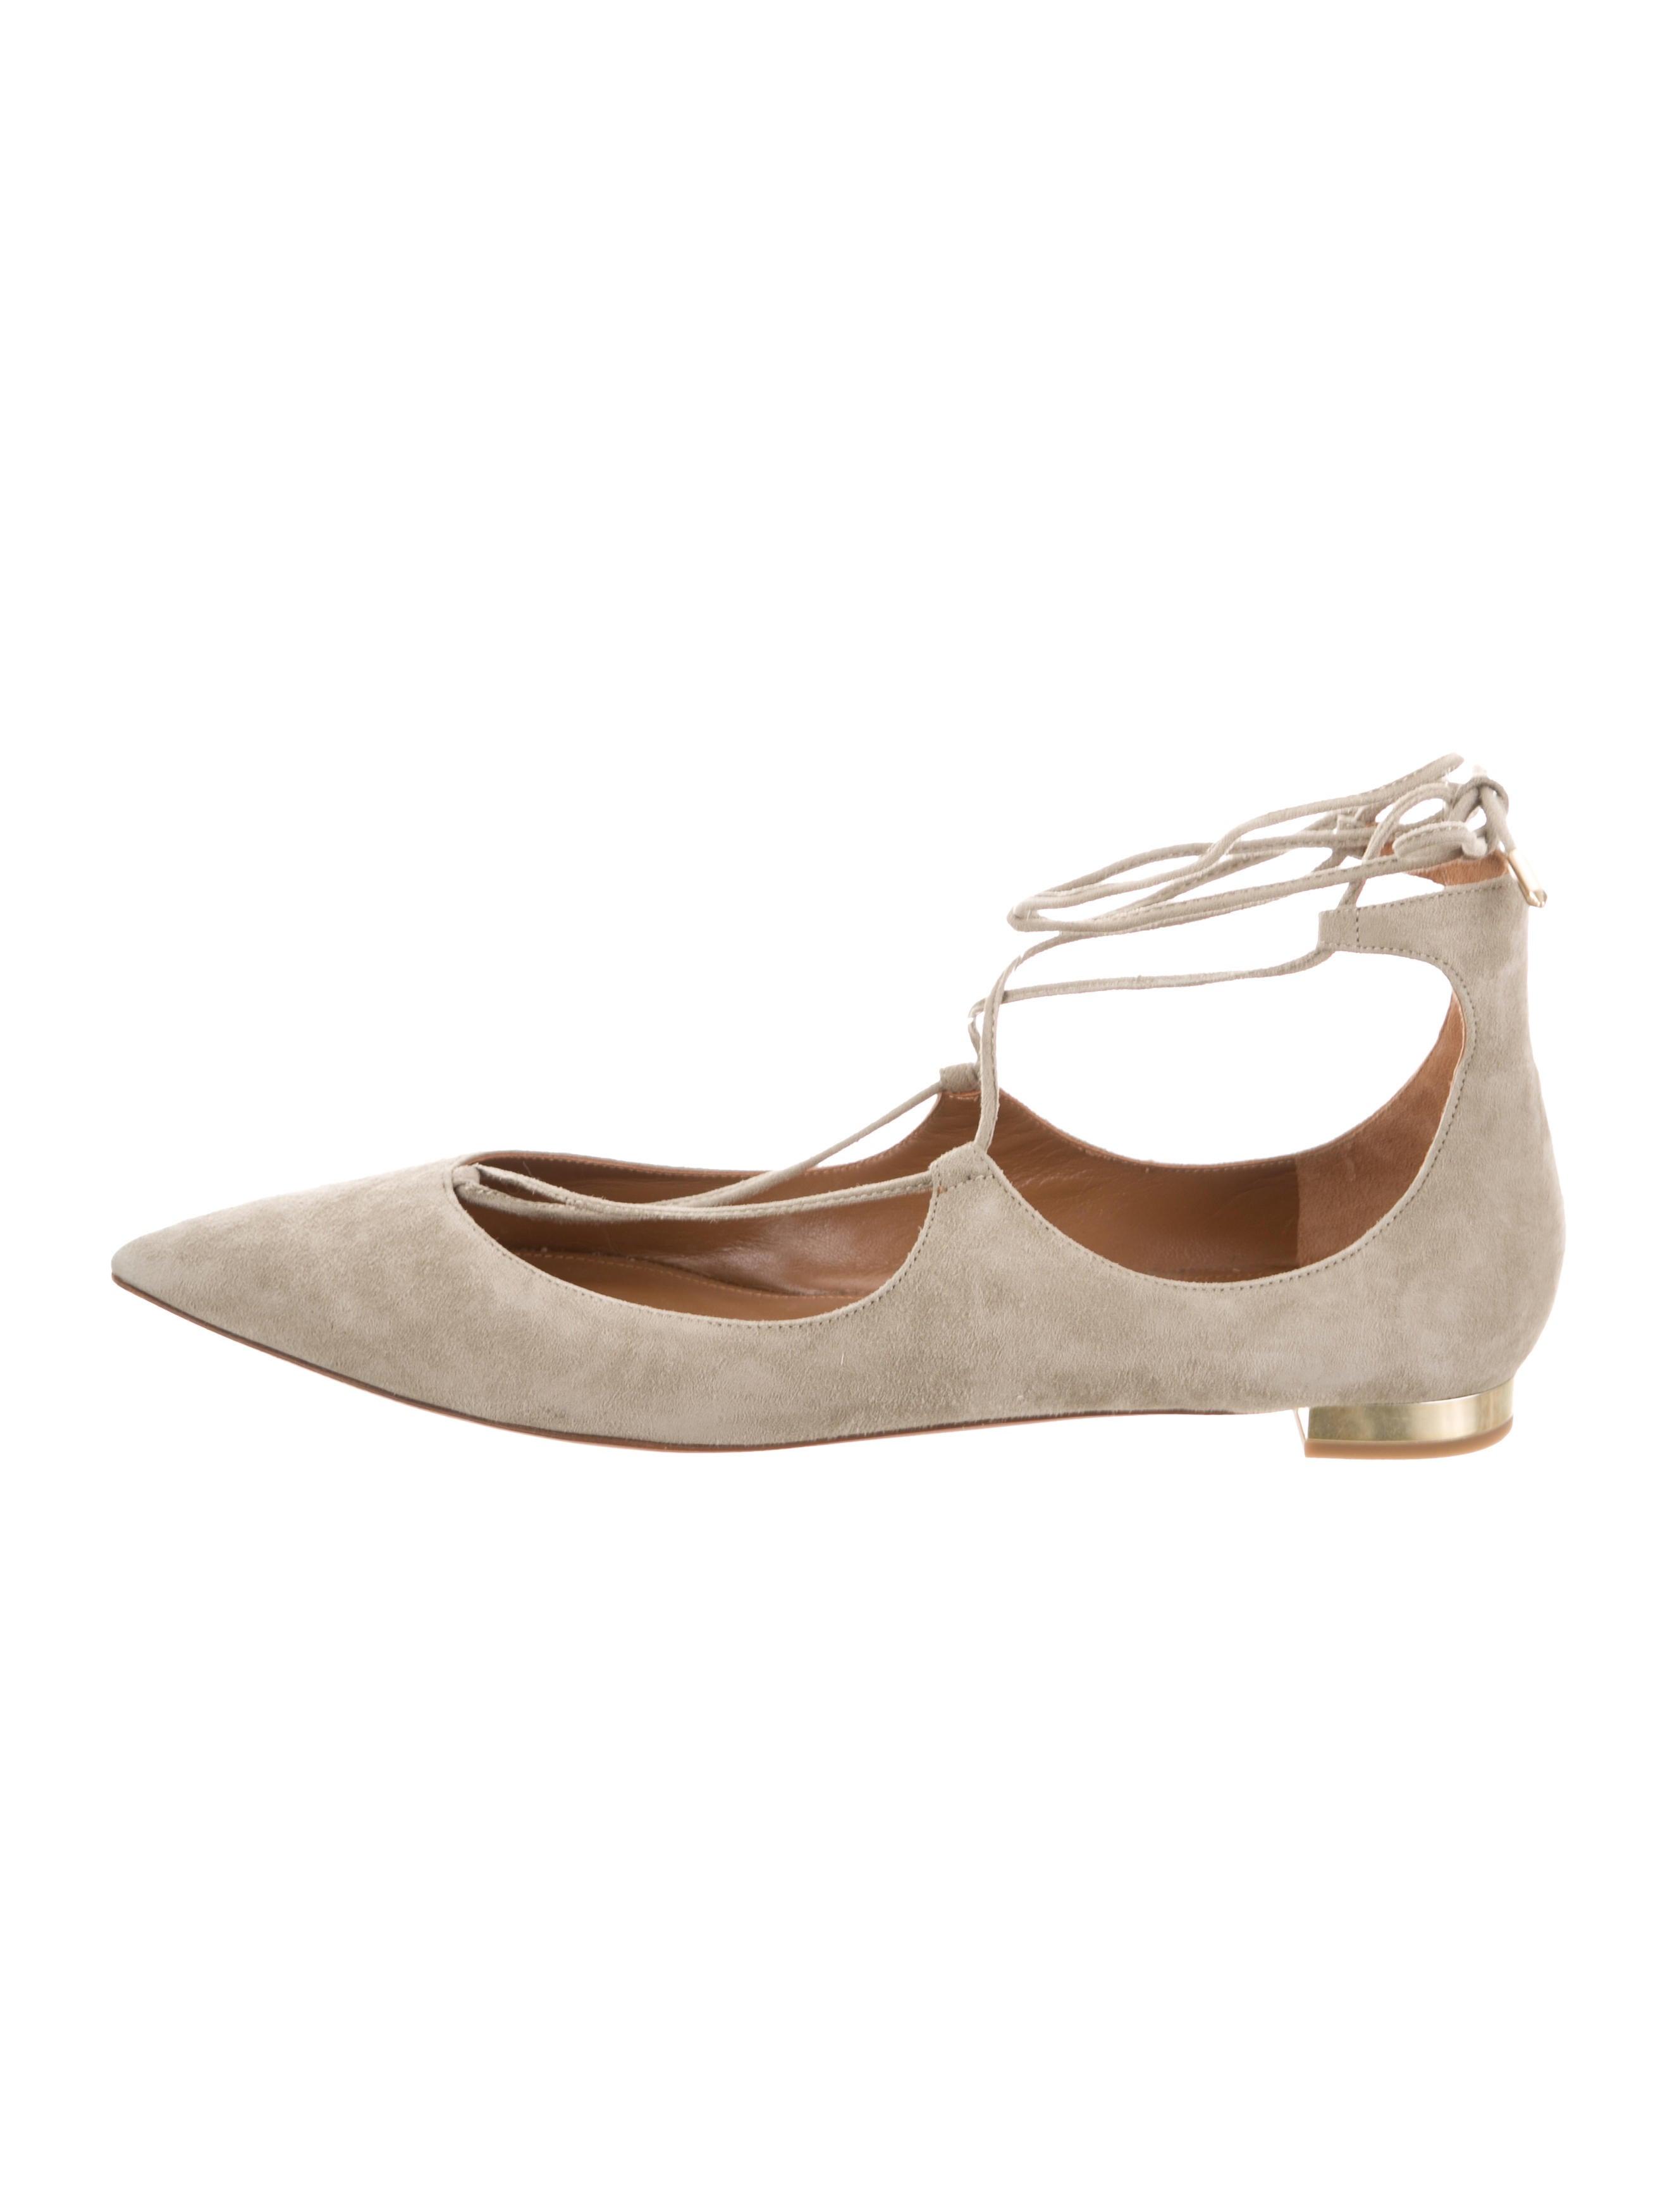 32686156b Aquazzura Christy Pointed-Toe Flats - Shoes - AQZ29193   The RealReal